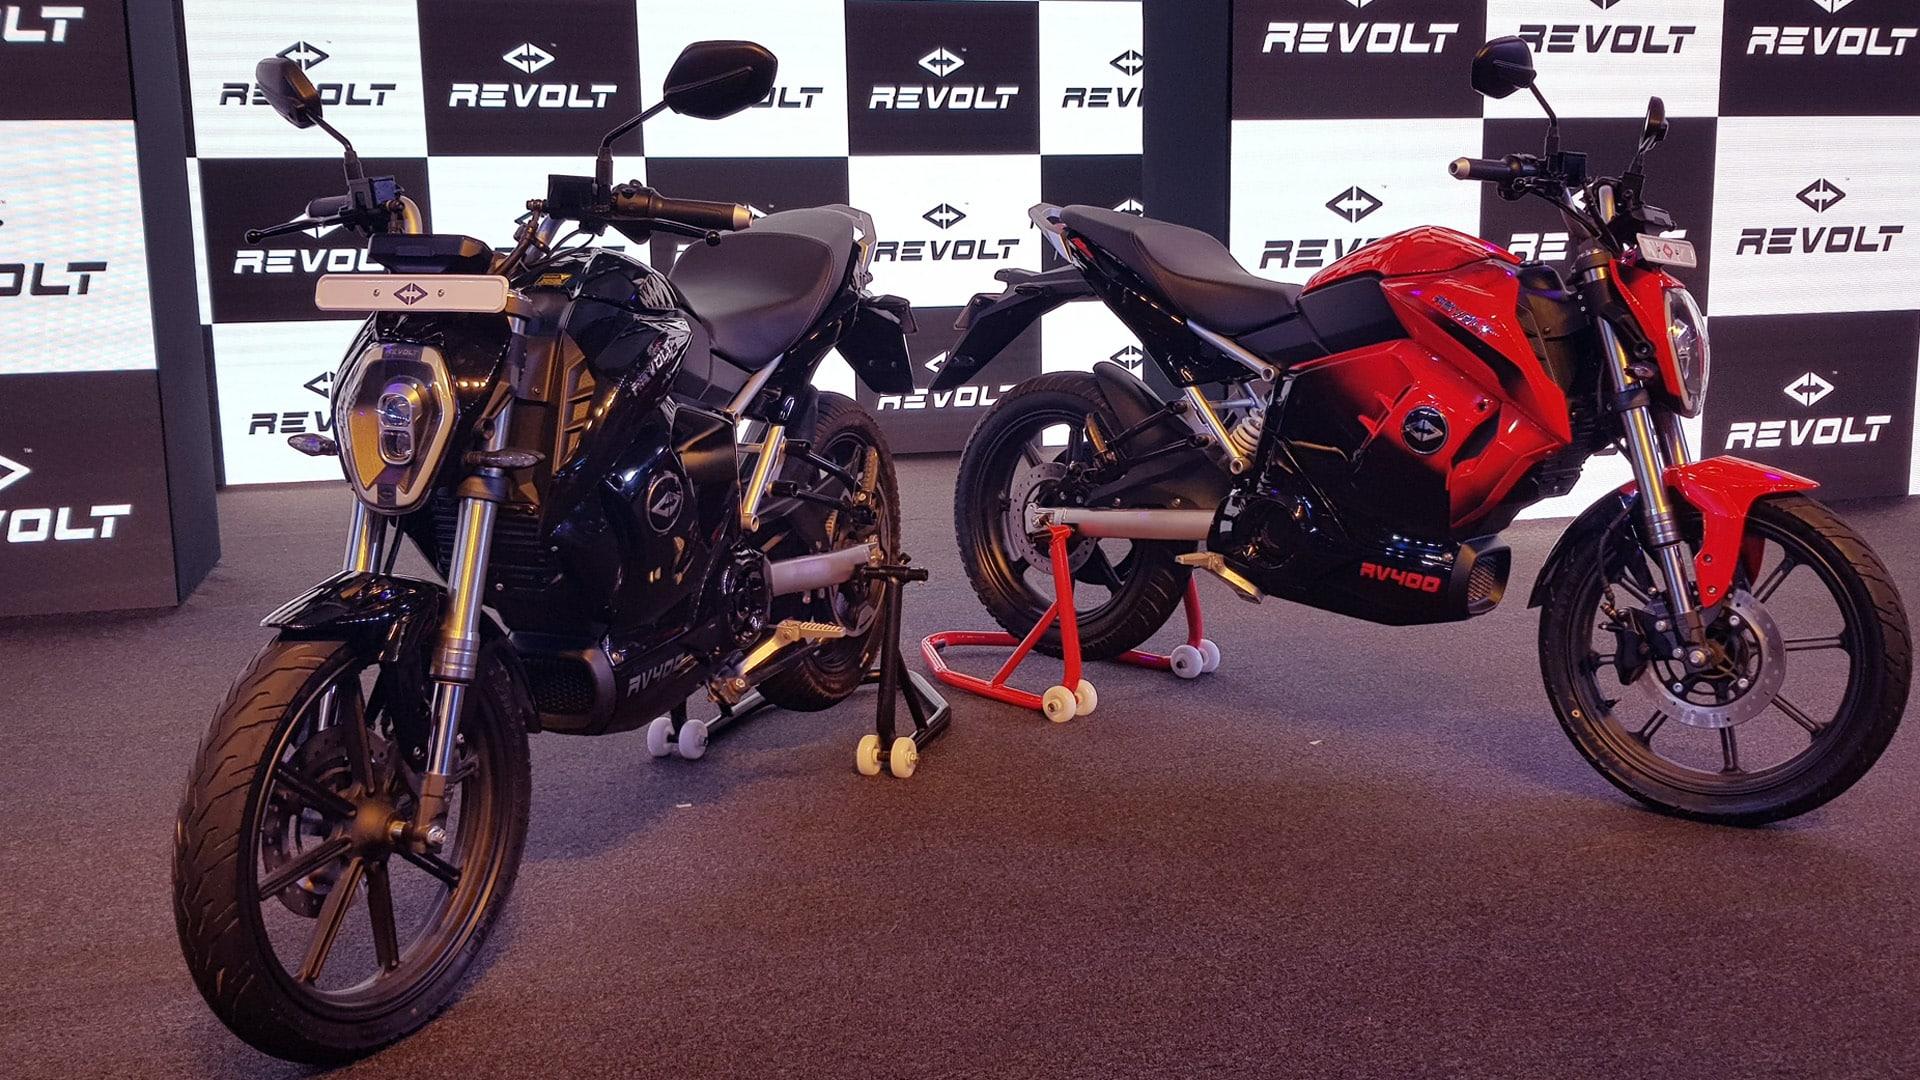 Revolt to open EV dealerships in three new cities in October